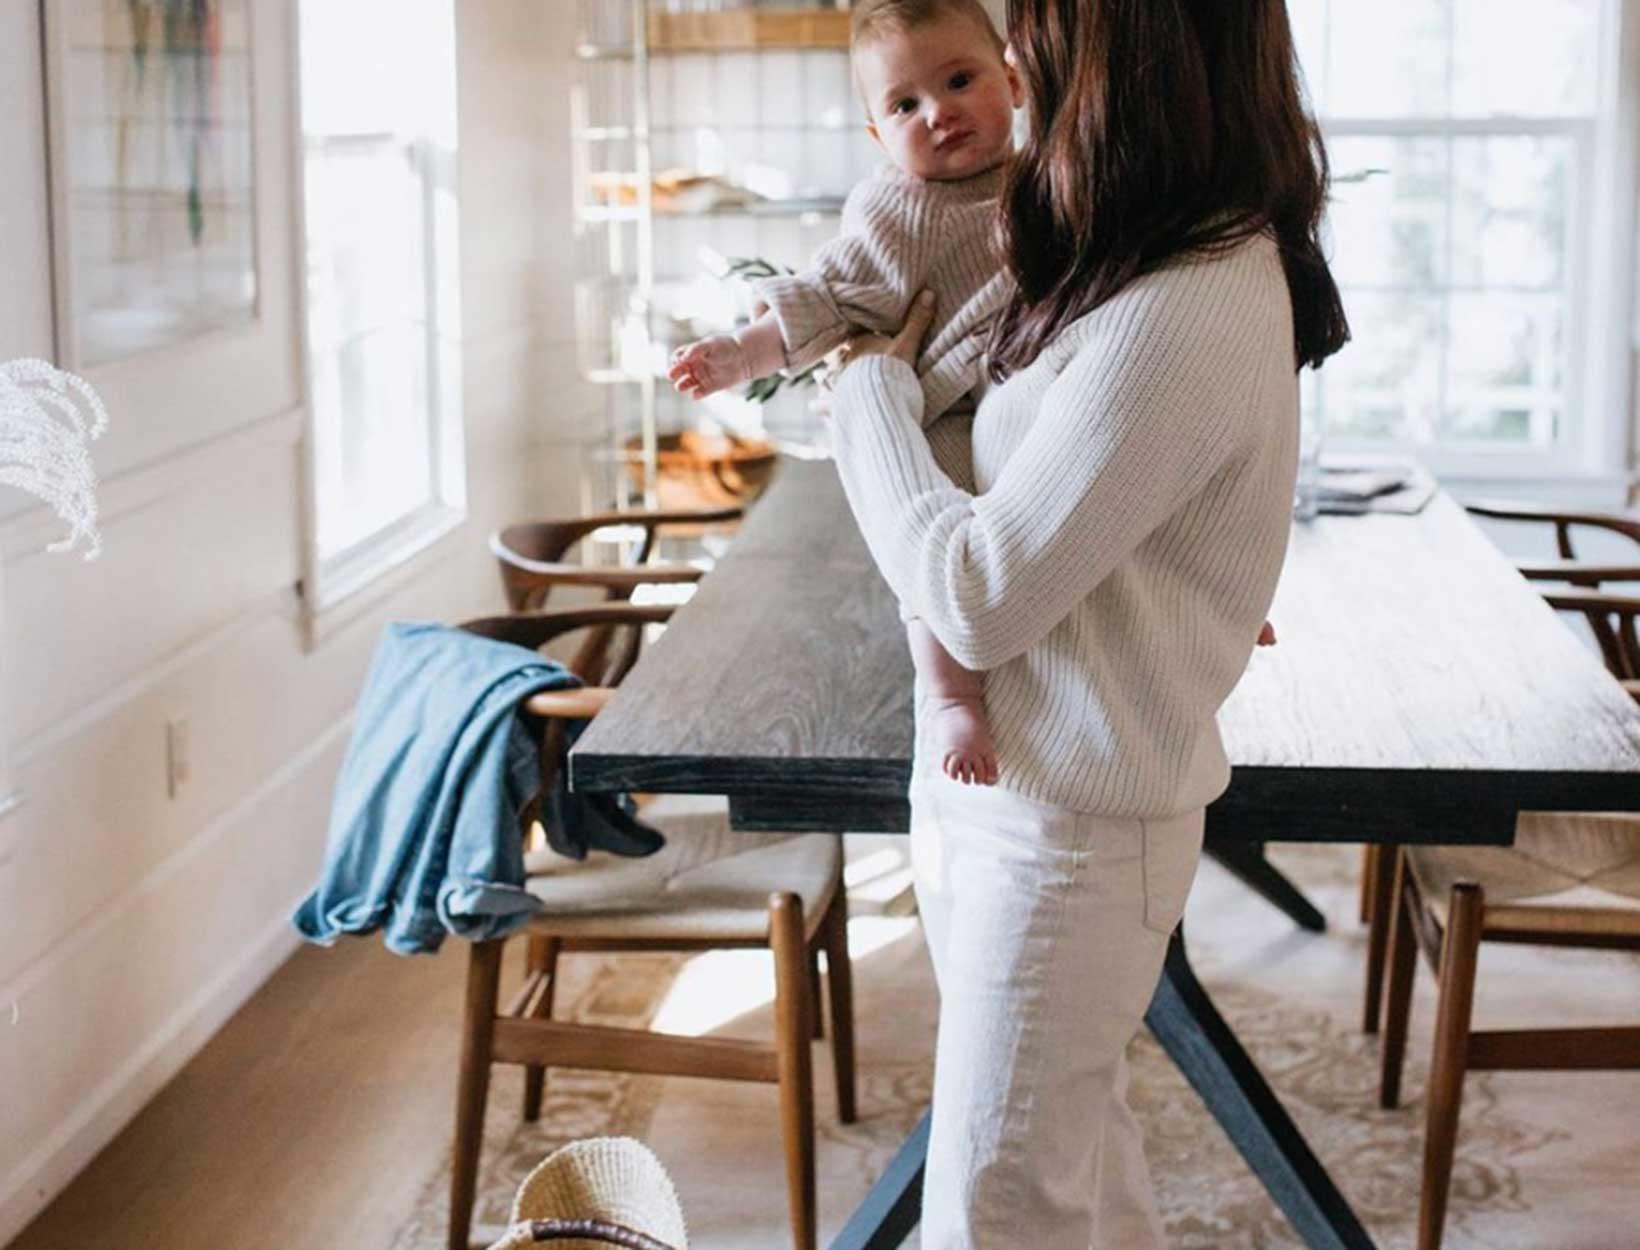 Women in work clothes